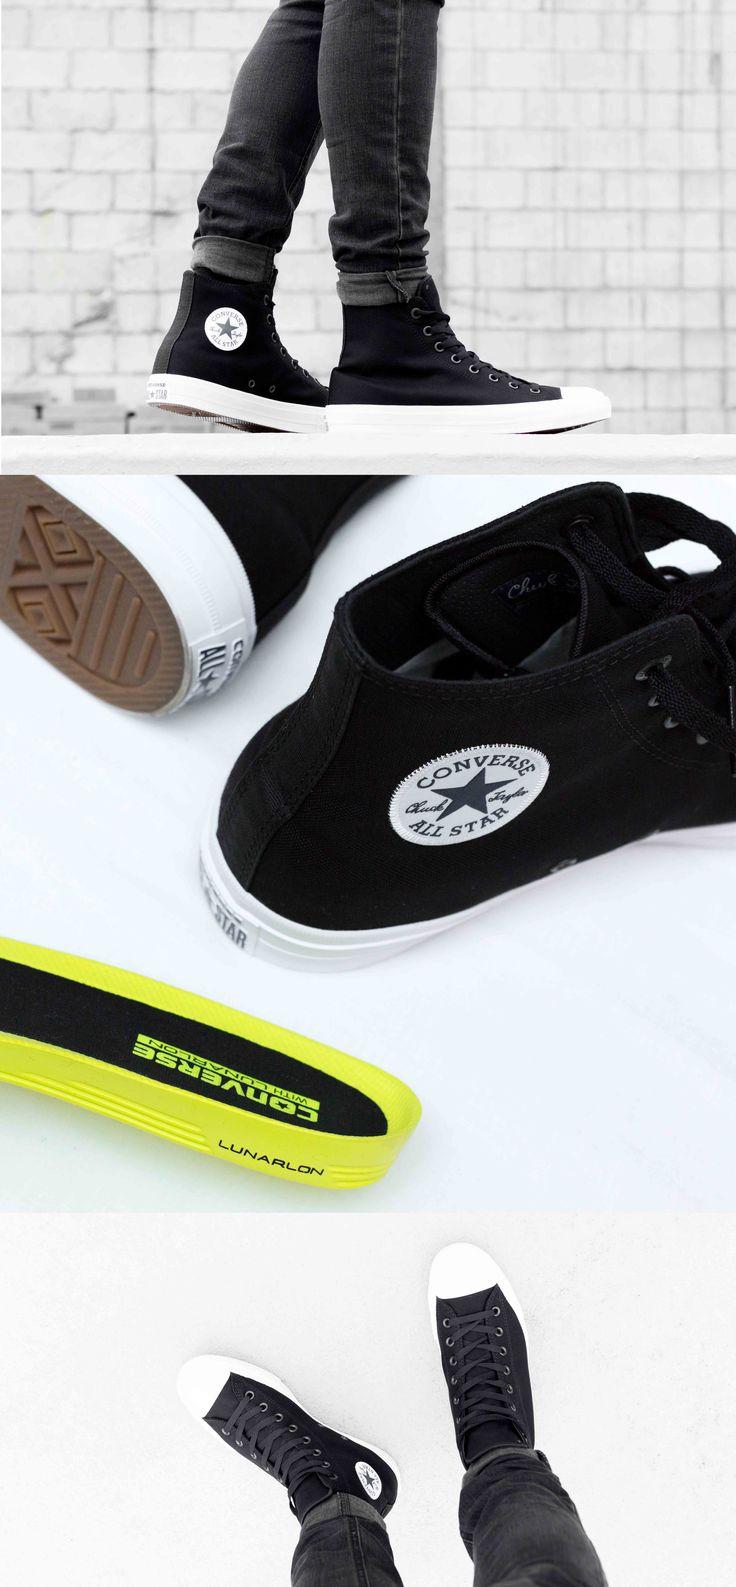 Footwear Introducing the Converse All Star Chuck Taylor II